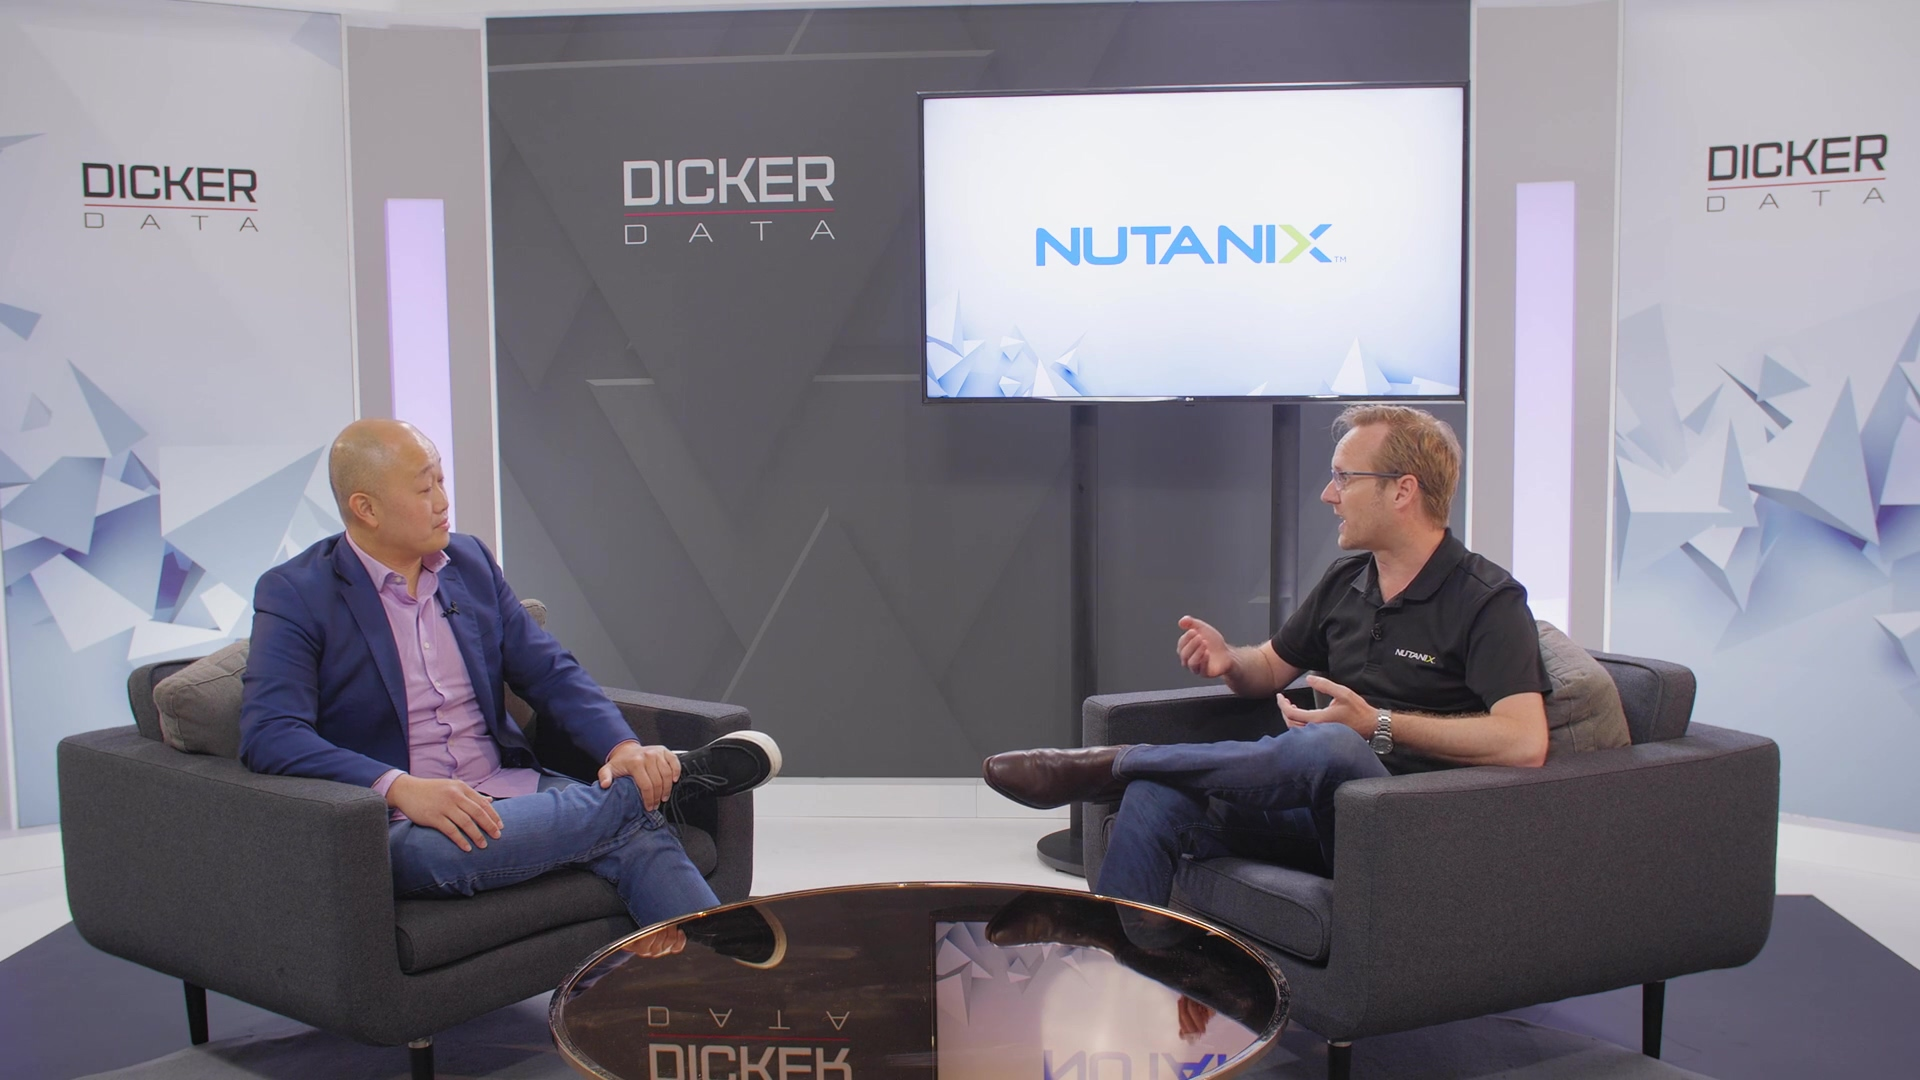 Nutanix MSP Distributor | Dicker Data